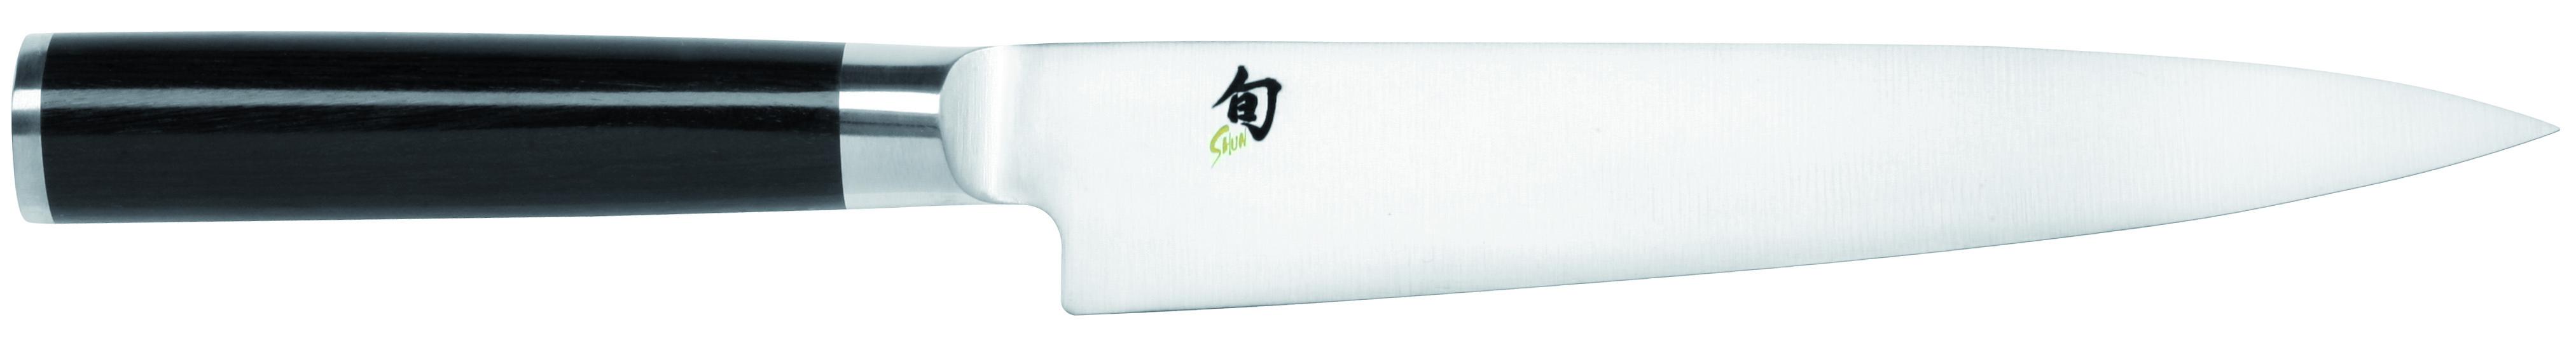 Flexibilný filetovací nôž Shun DM-0761